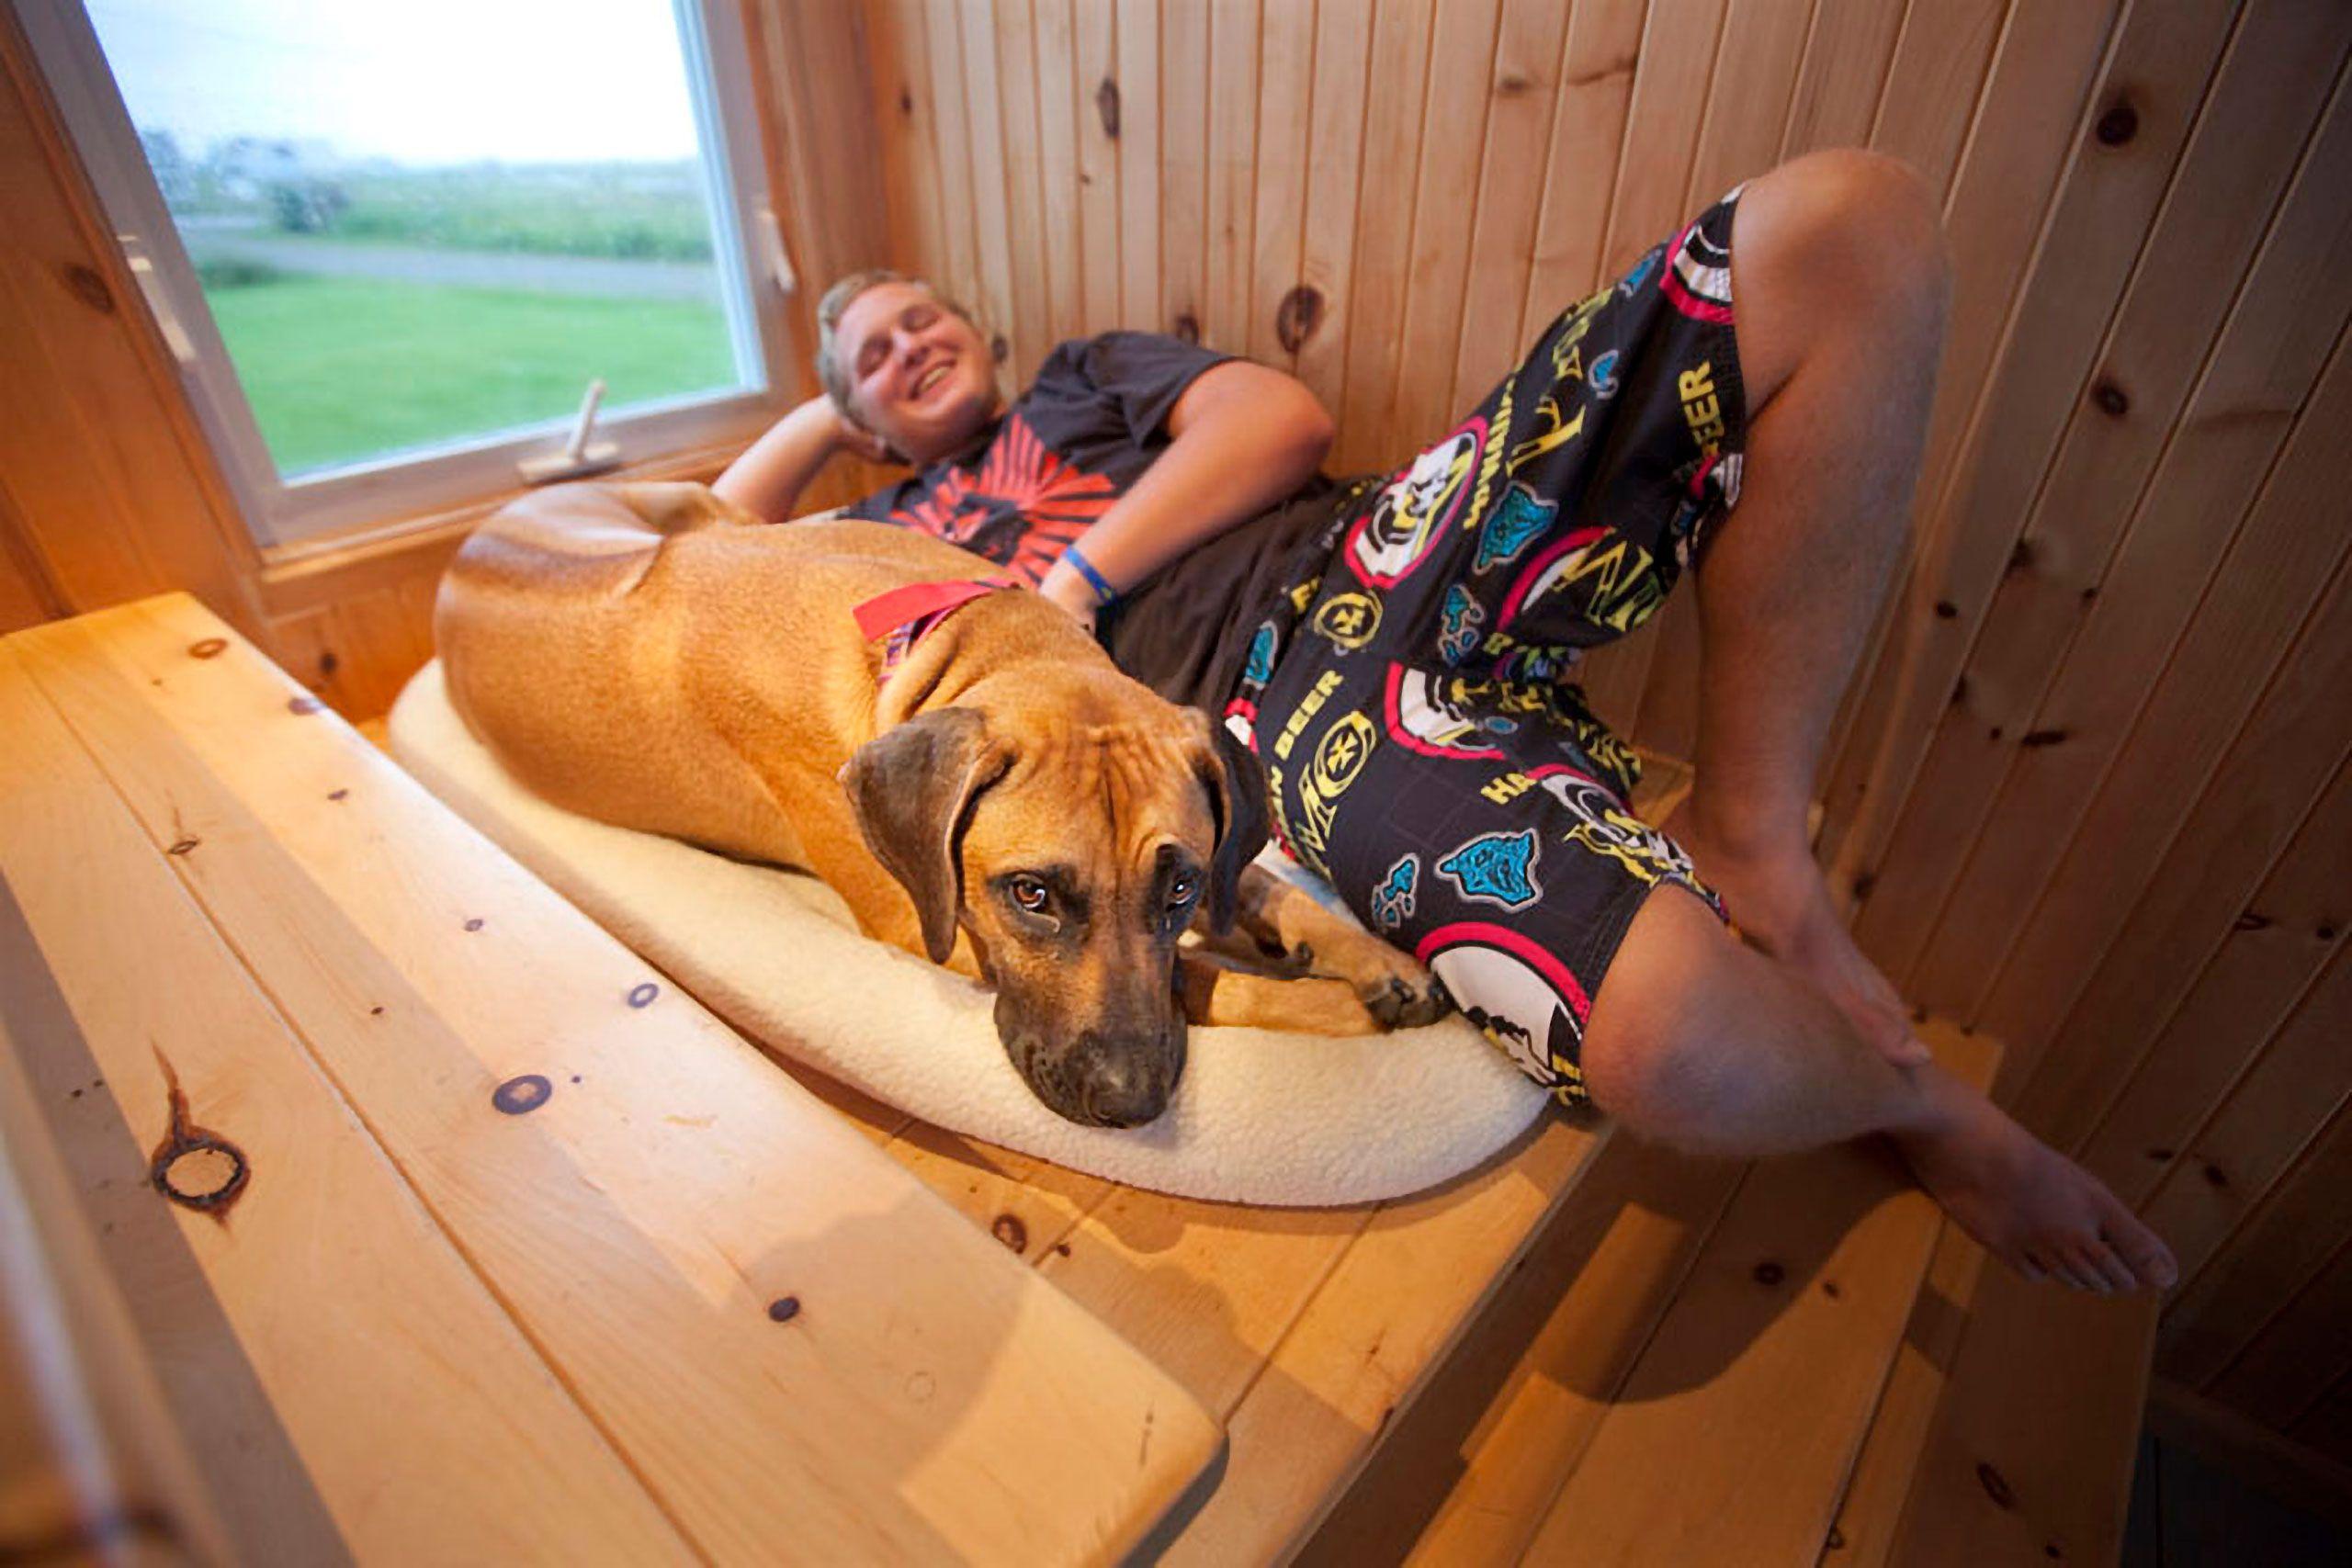 bog and dog relaxing cuddling Jack Roos with Rhodesian ridgeback in the summer  Magdalen Islands Îles de la Madeleine Harve Aubert Quebec Canada